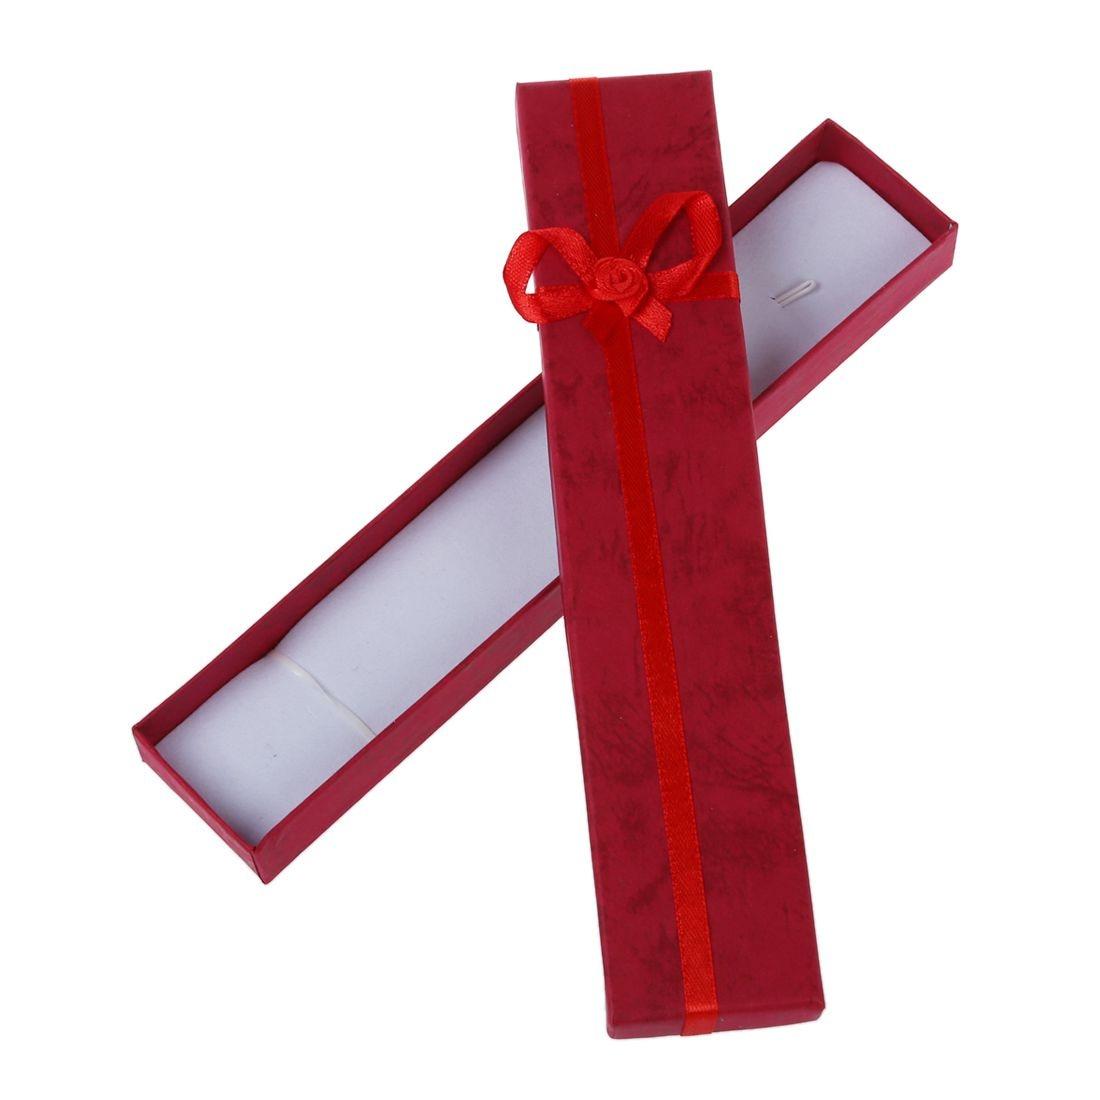 Dark Red Rectangular Jewellery Necklace Case Cardboard Gift Holder Box